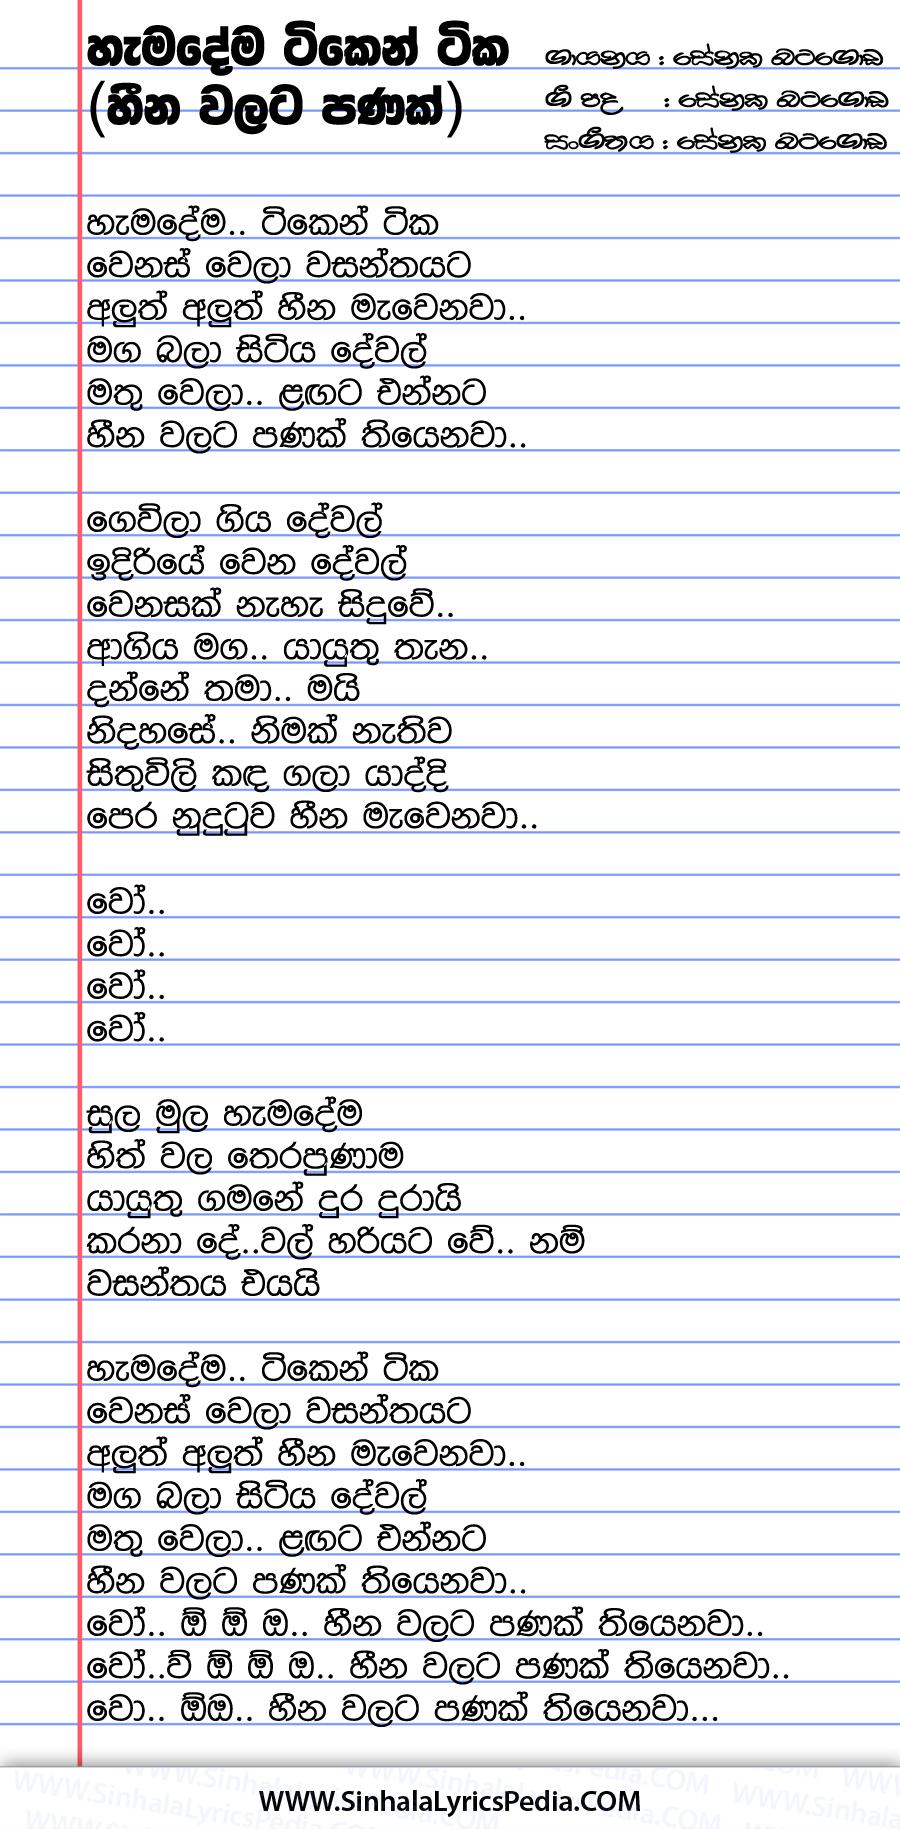 Hemadema Tiken Tika (Heena Walata Panak) Song Lyrics